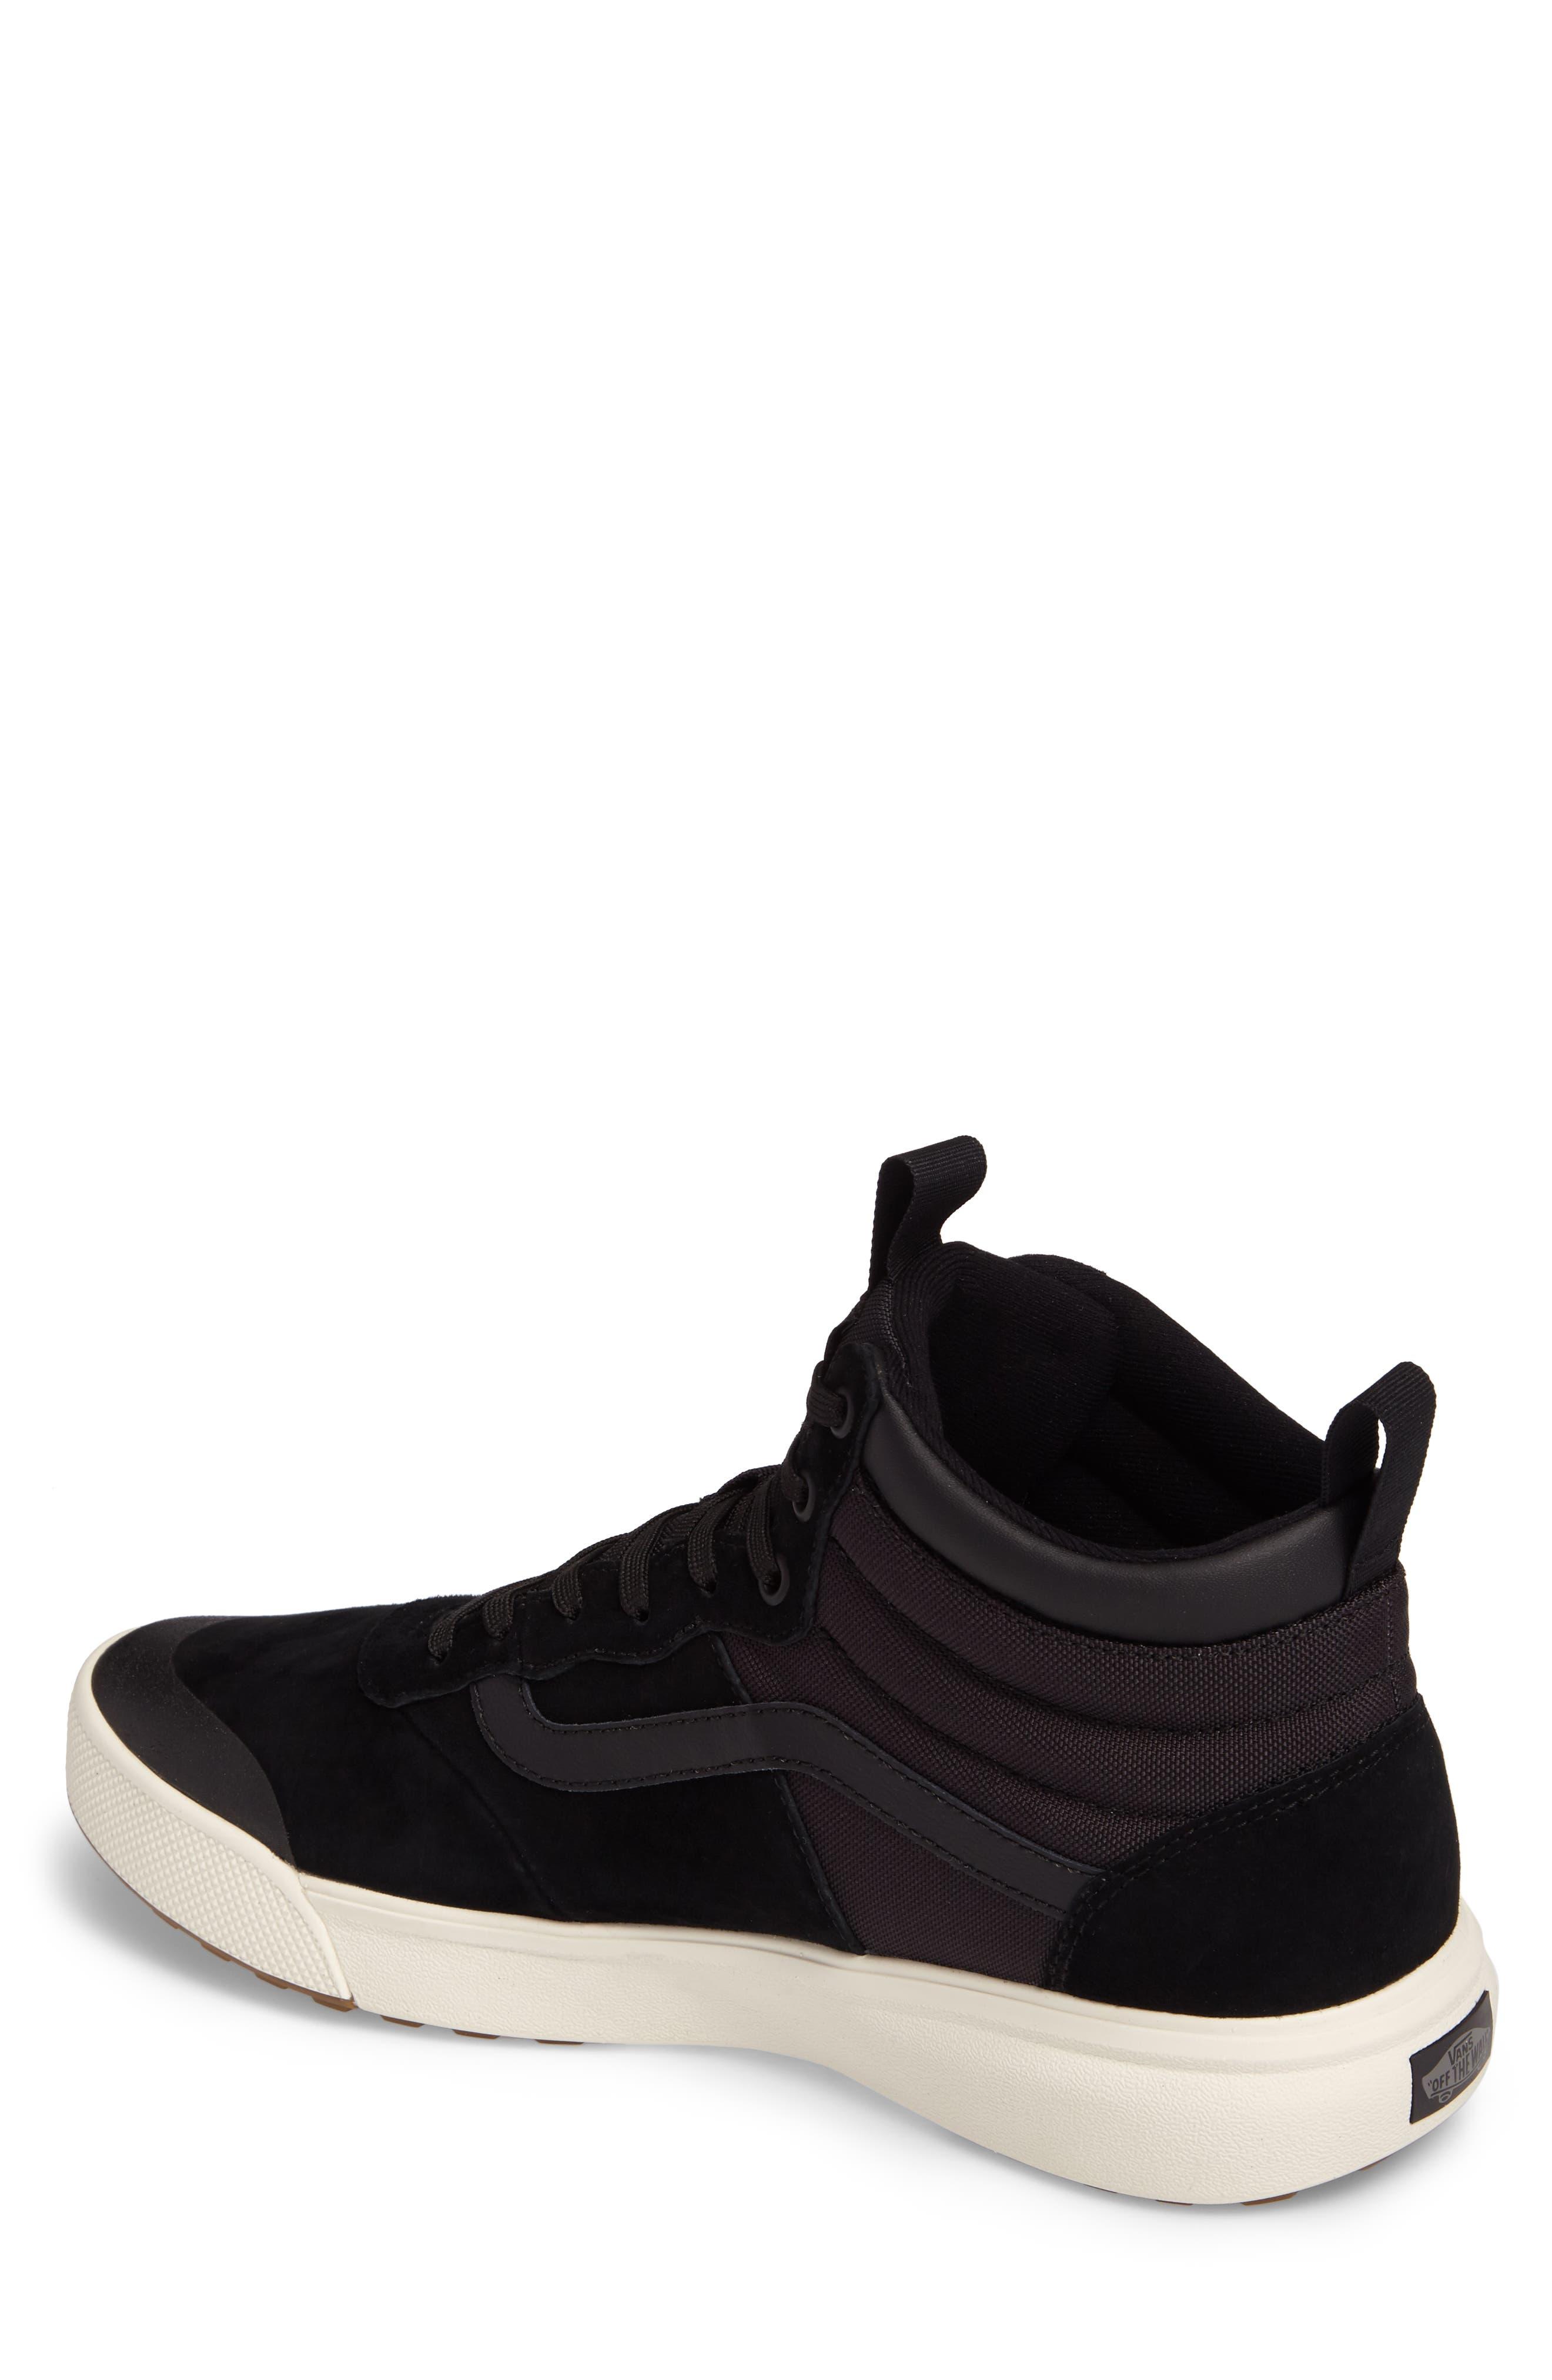 Ultrarange Hi Sneaker,                             Alternate thumbnail 2, color,                             BLACK SUEDE